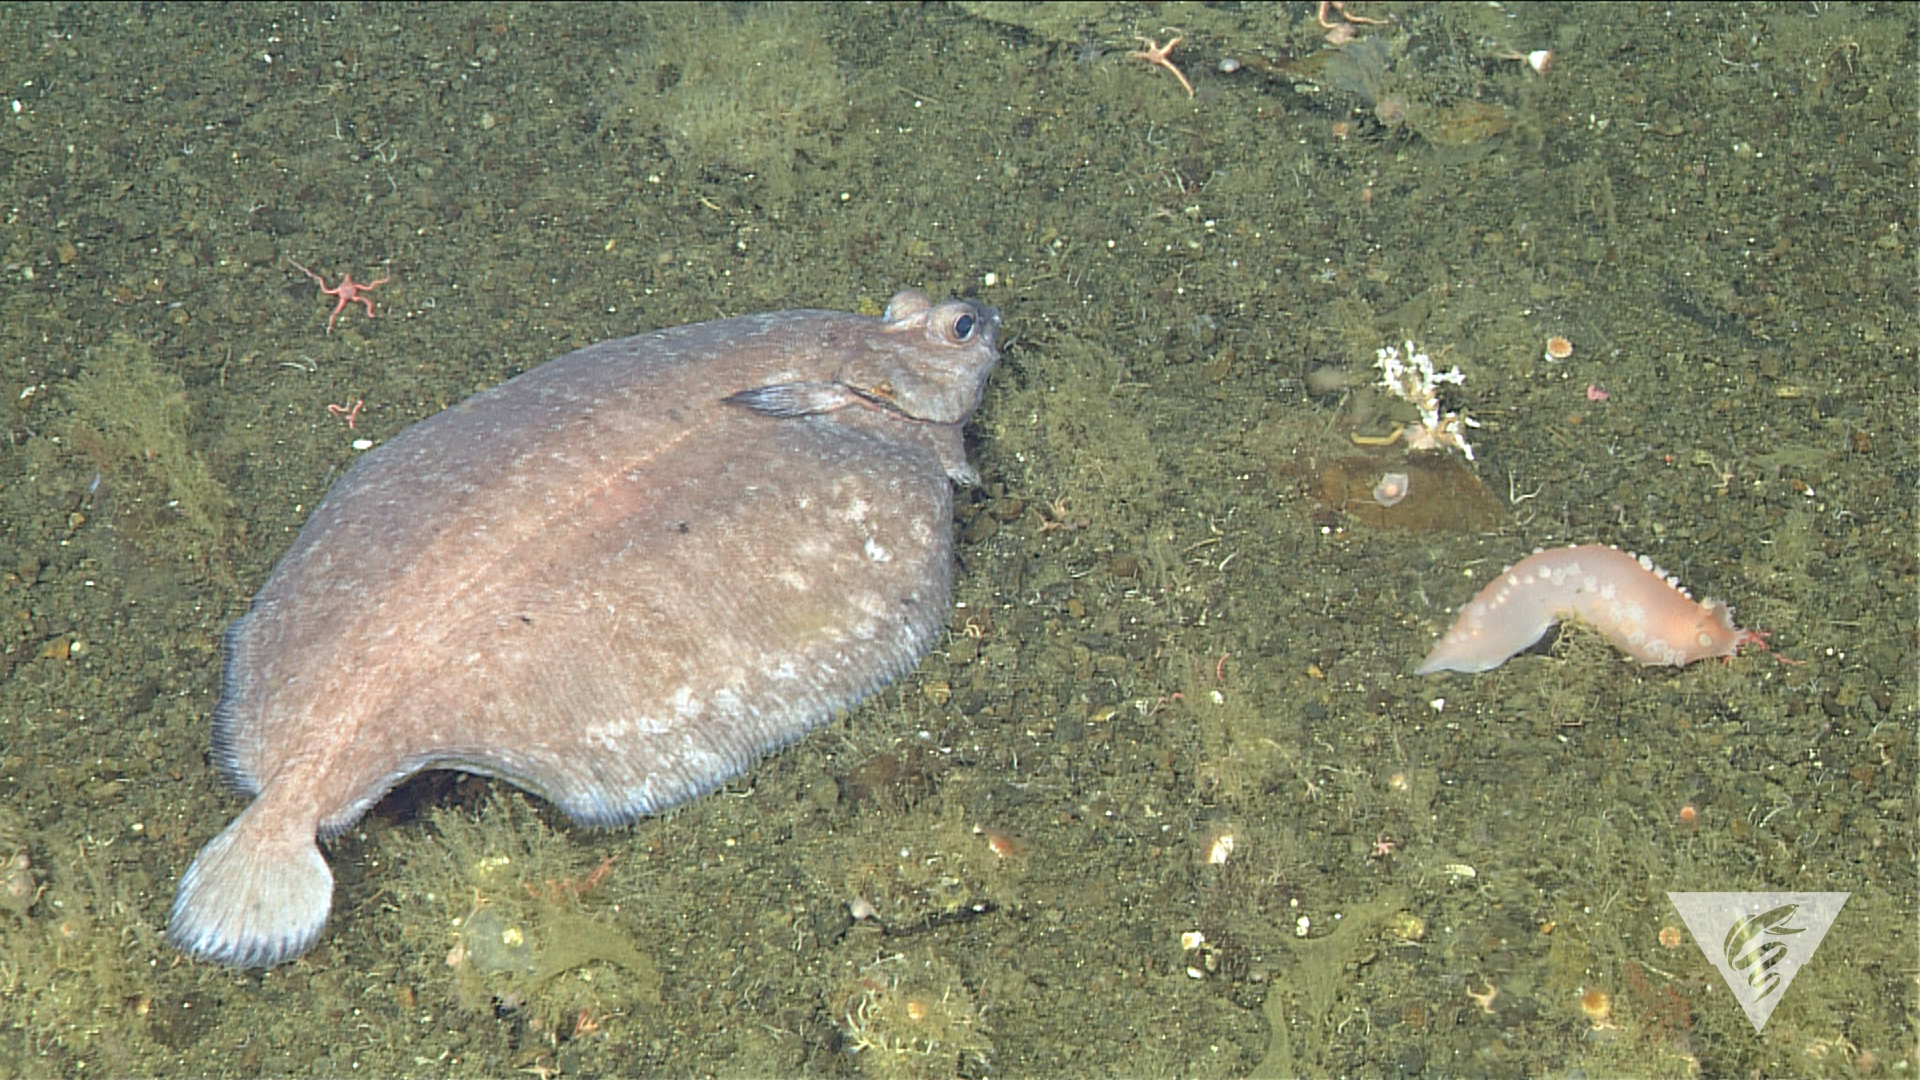 Flatfish and nudibranch